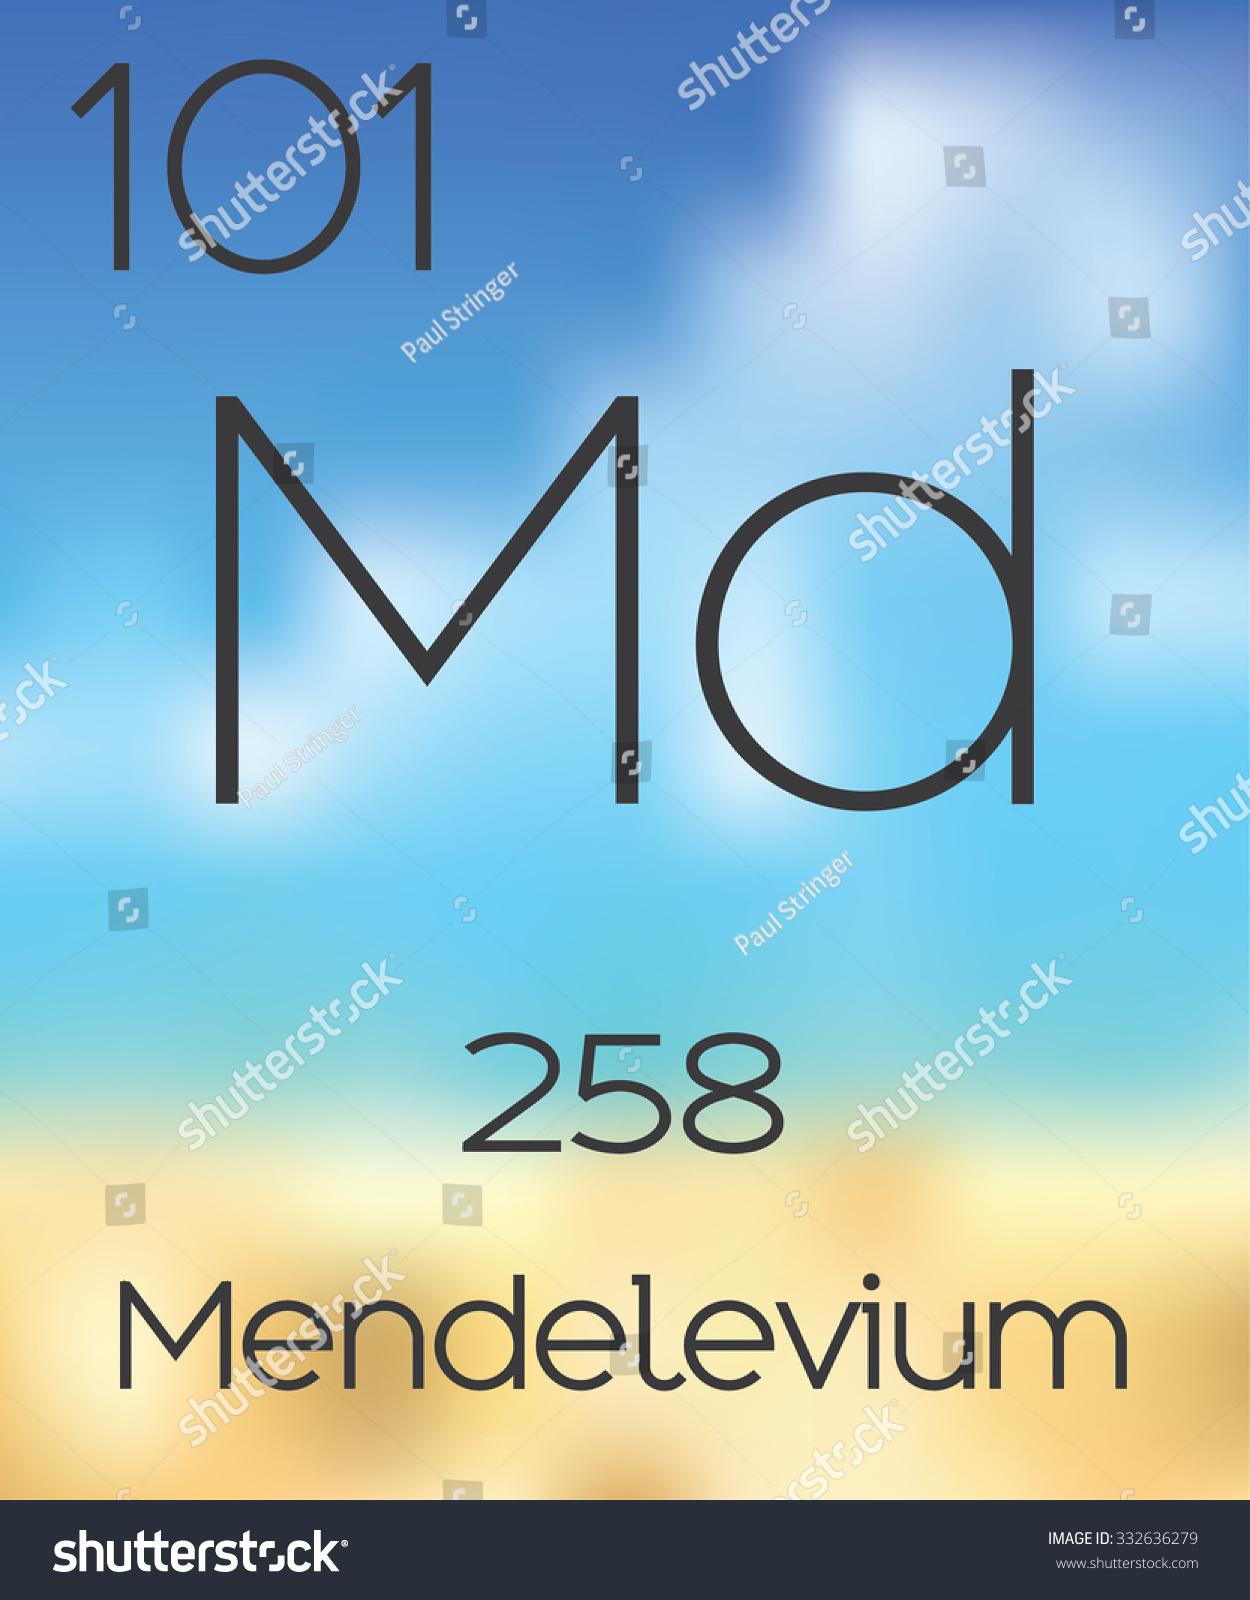 Periodic table elements mendelevium stock vector 332636279 the periodic table of the elements mendelevium urtaz Gallery